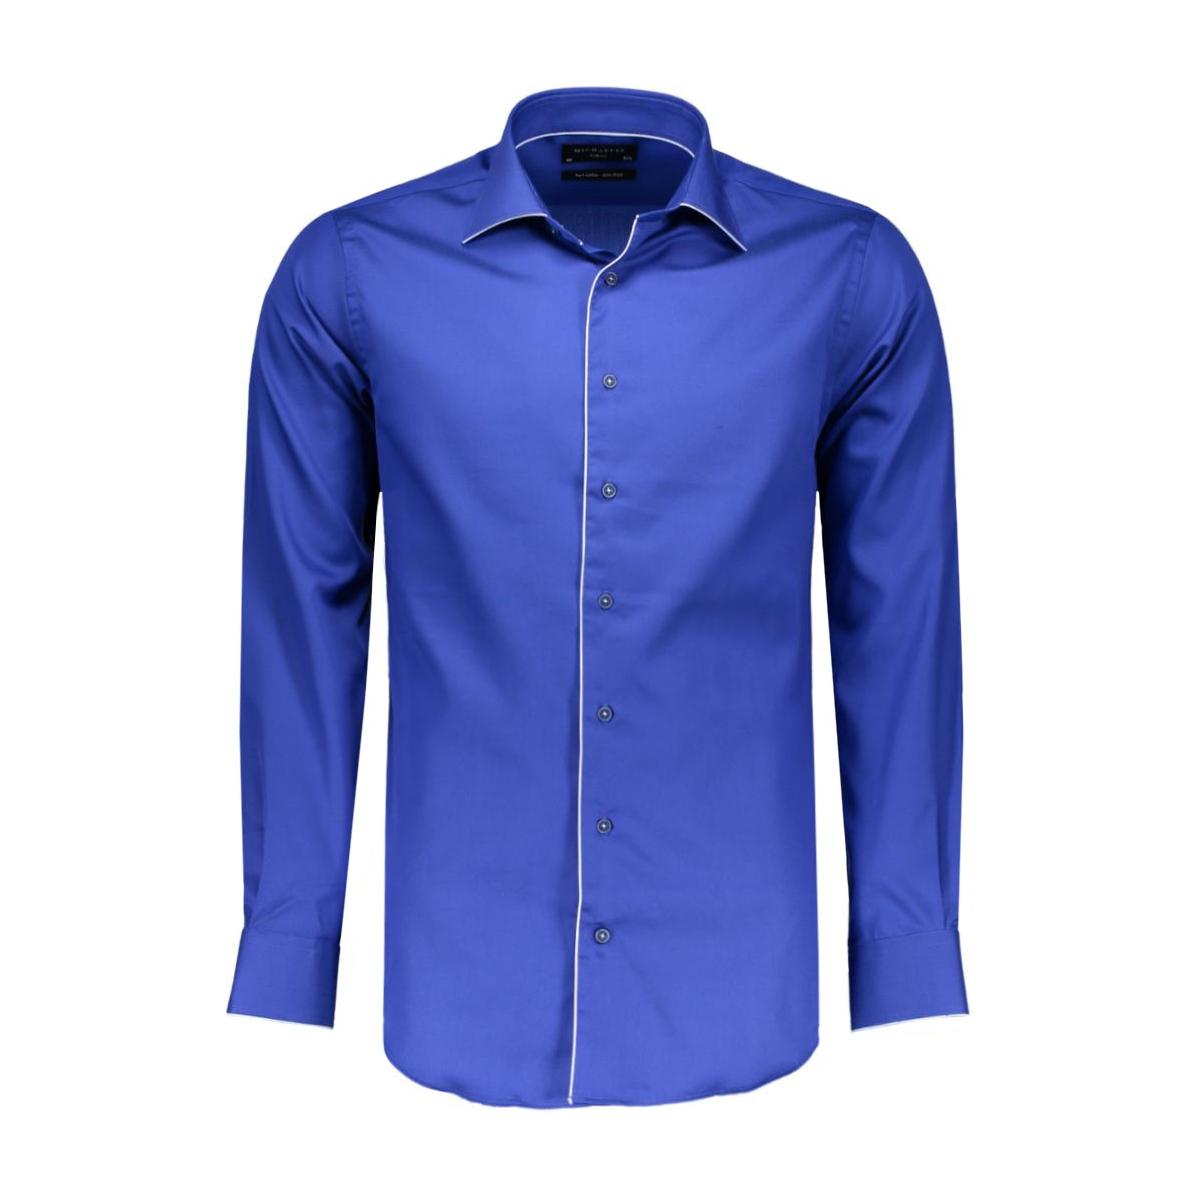 pmnh300031 michaelis overhemd blue